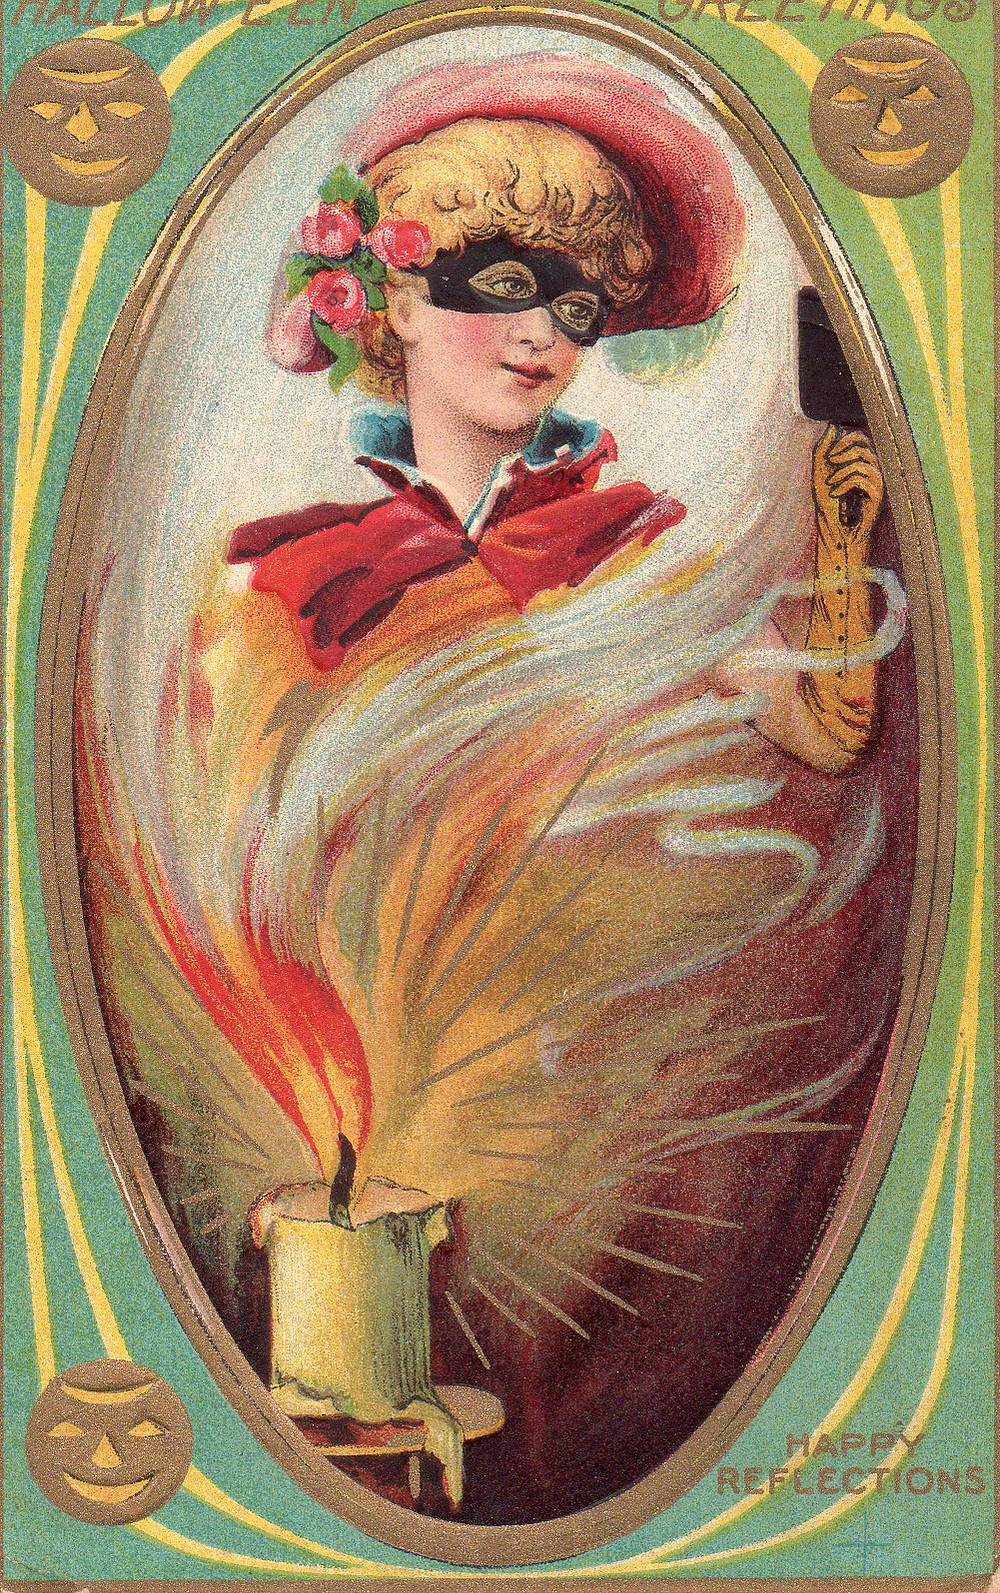 Halloween postcard 1909